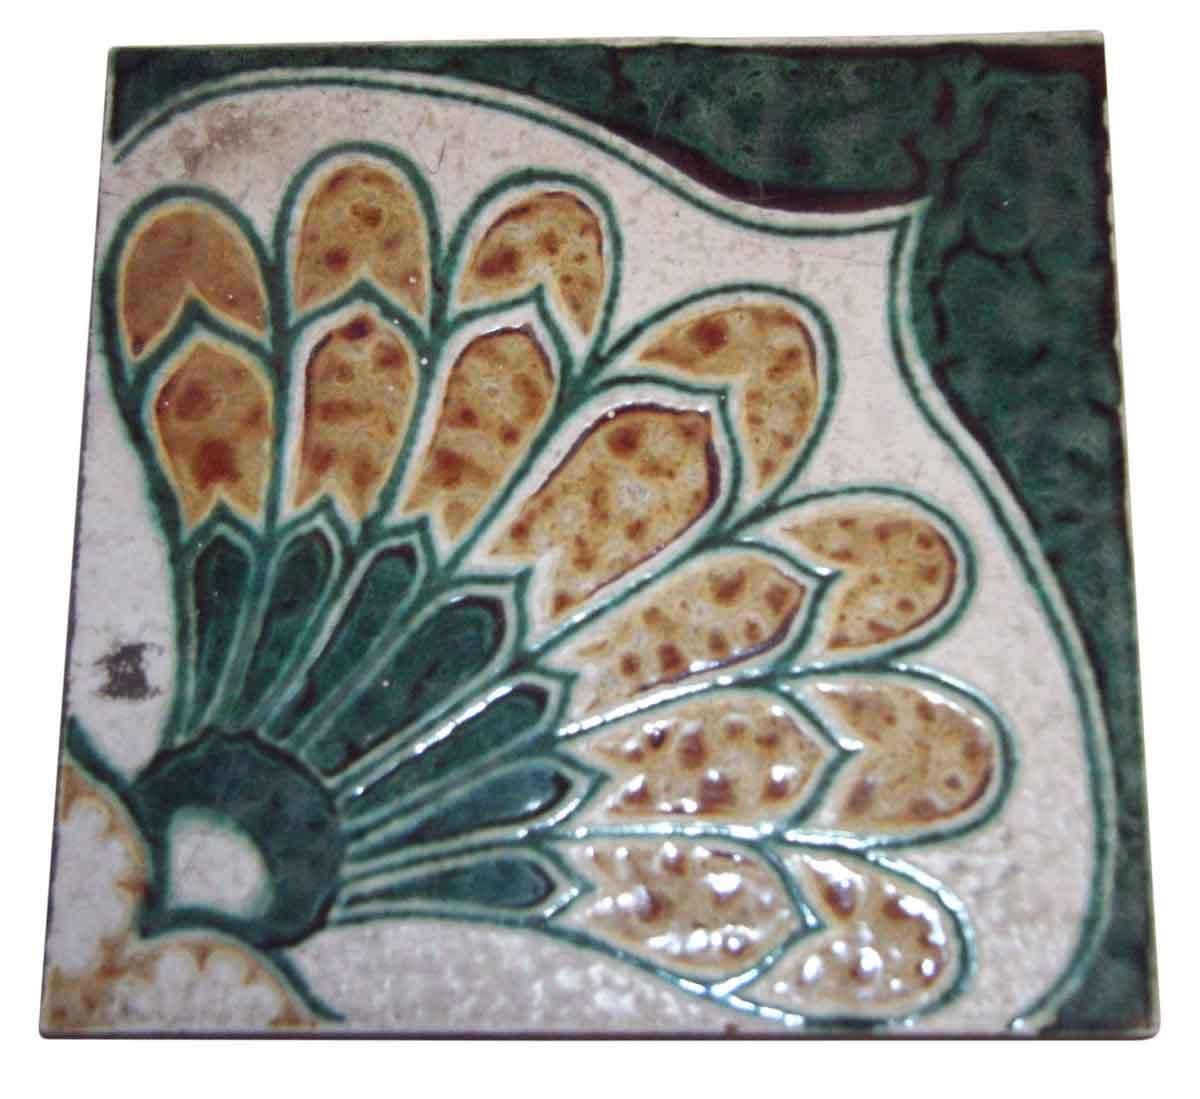 Original Antique Green and White Floor Tile